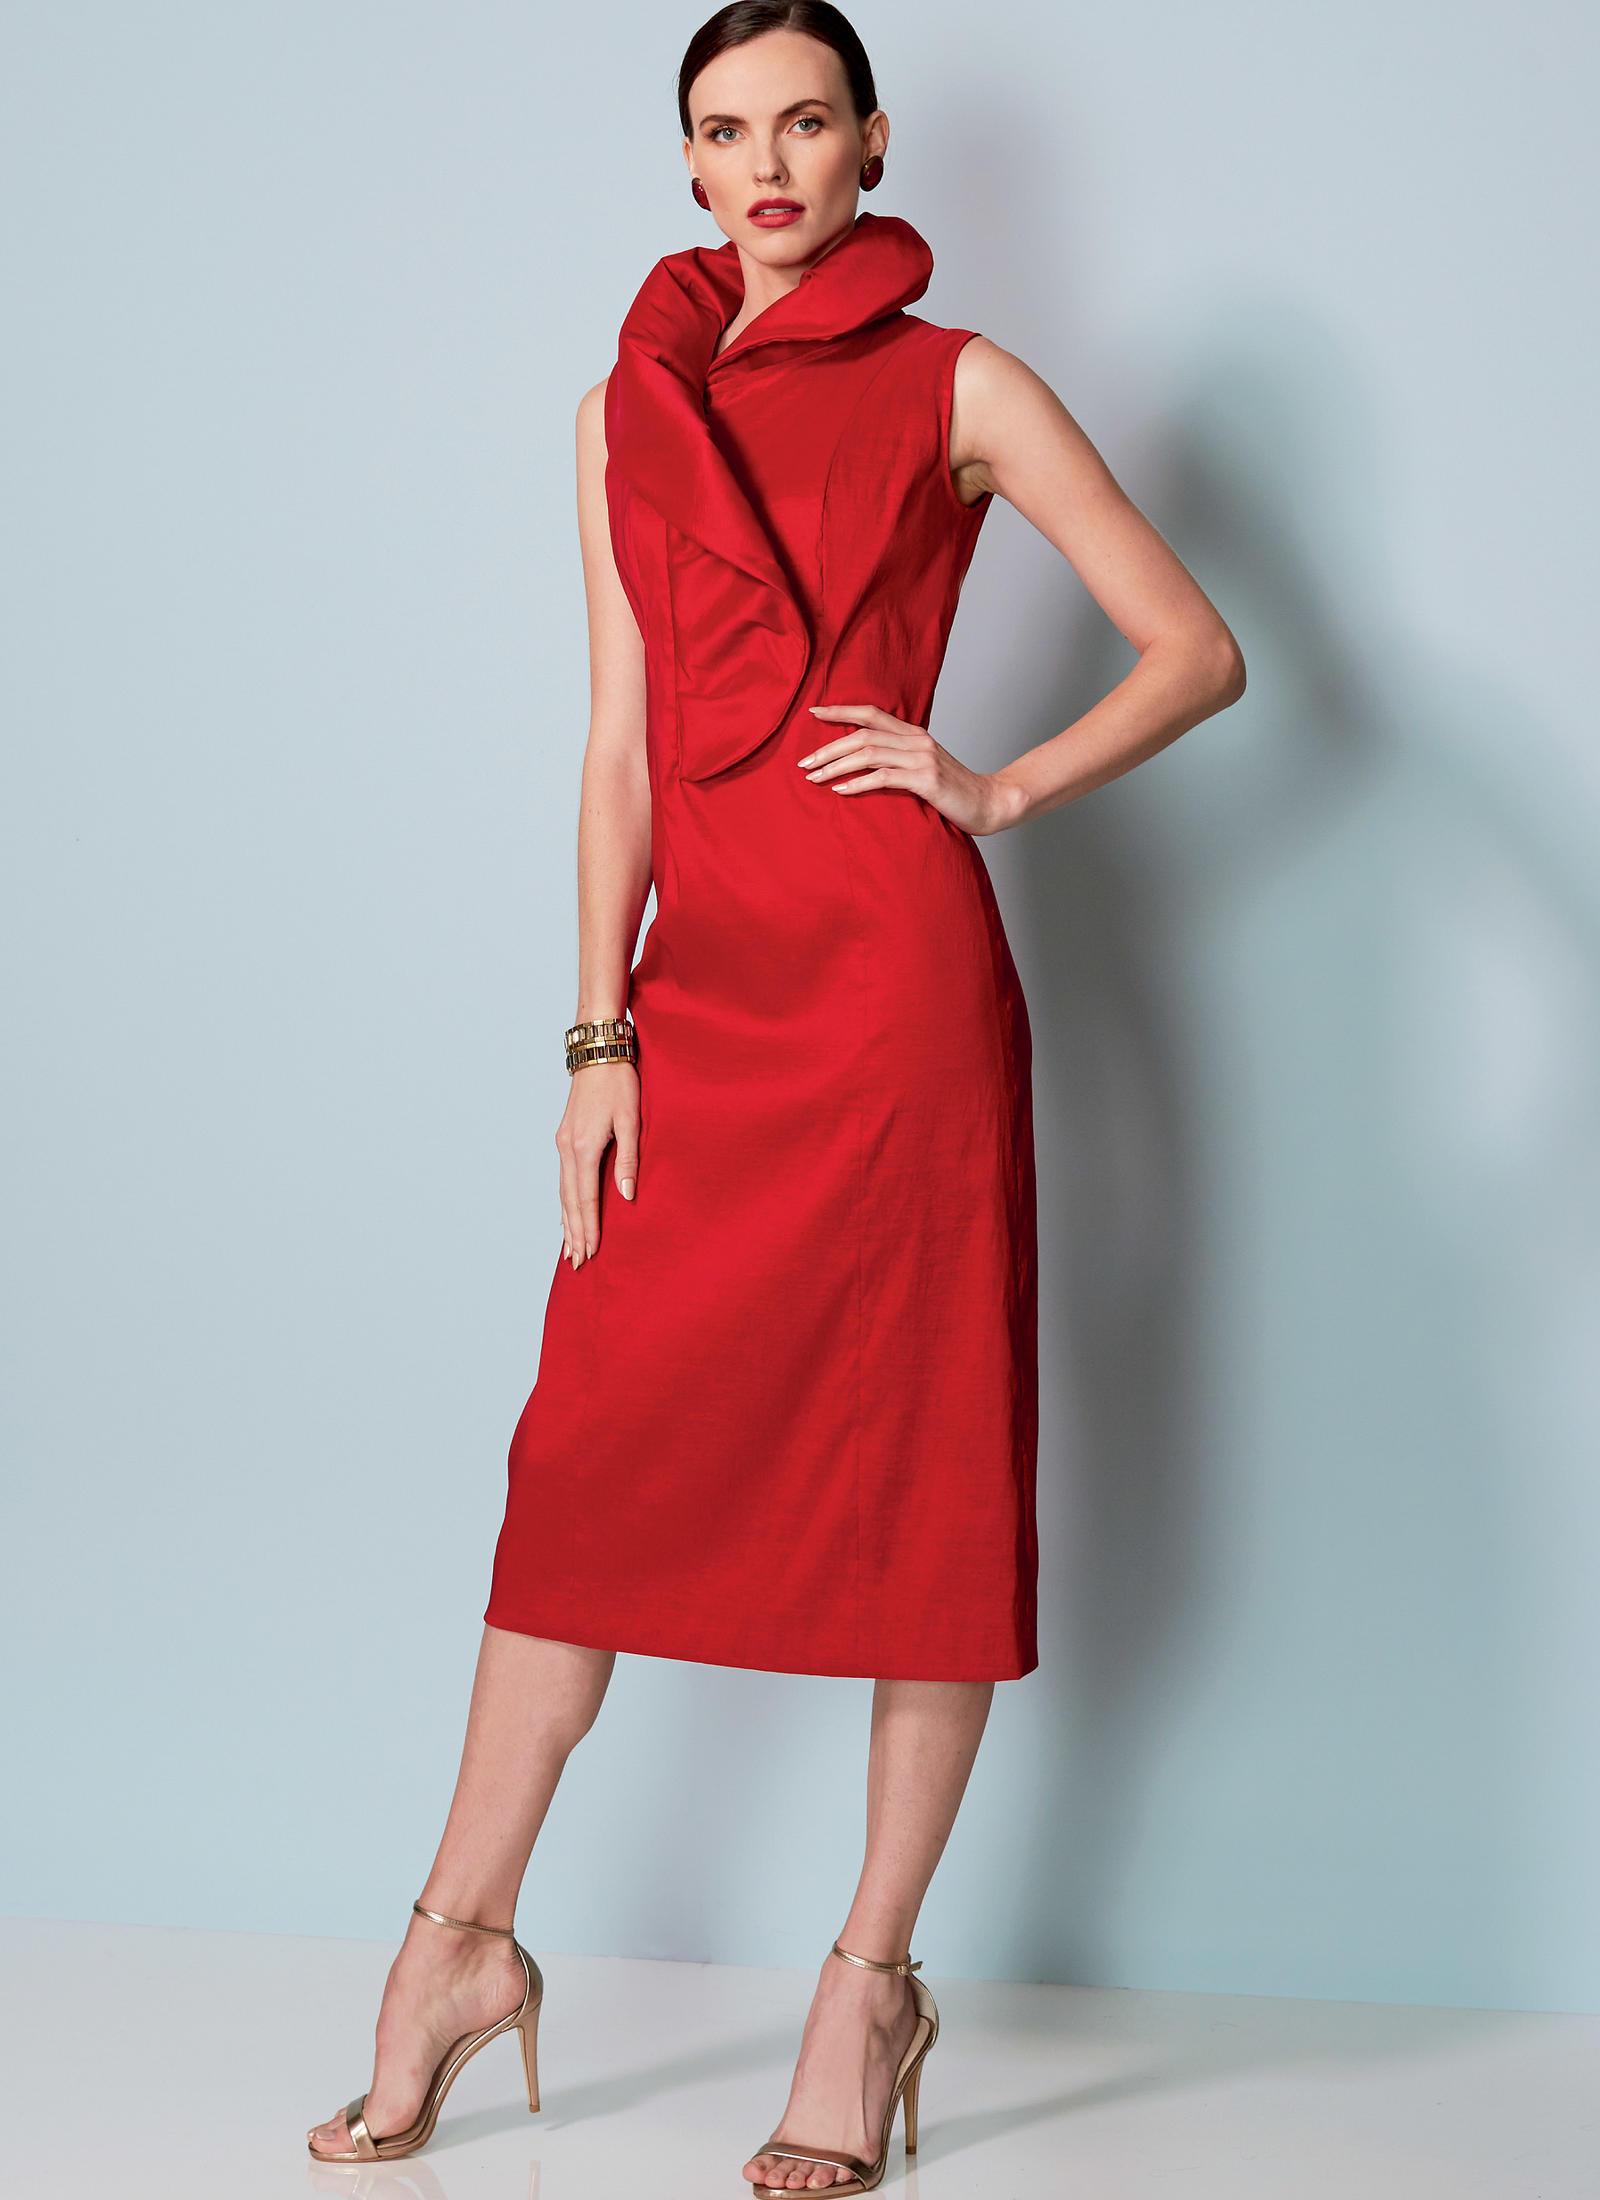 Vogue Patterns 9241 MISSES' PRINCESS SEAM DRESSES WITH